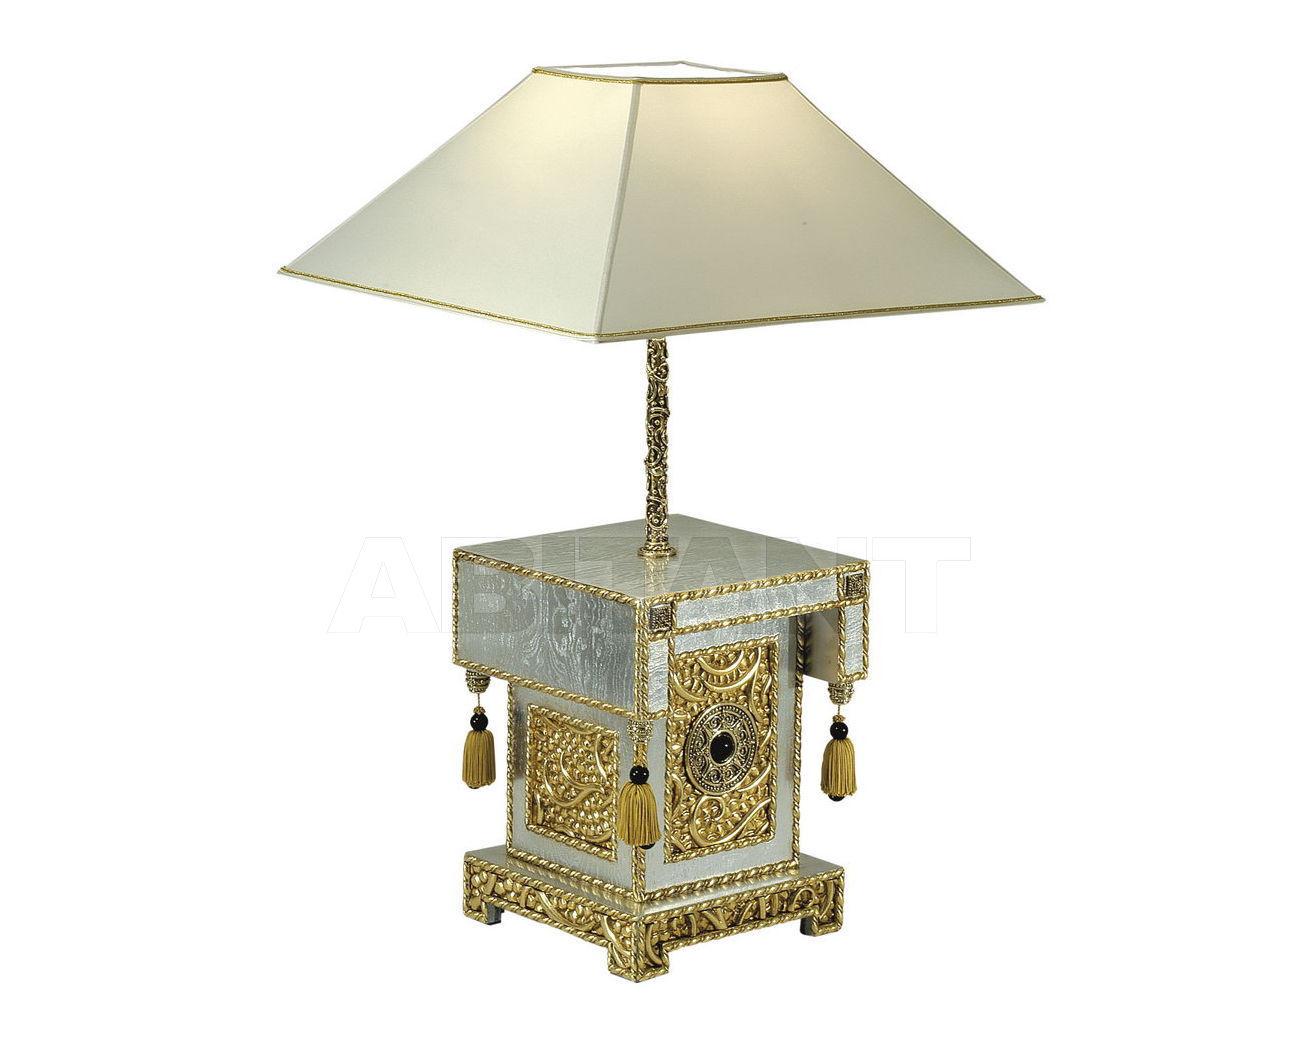 Купить Лампа настольная Colombostile s.p.a. Transculture/lampade 1828 LAS